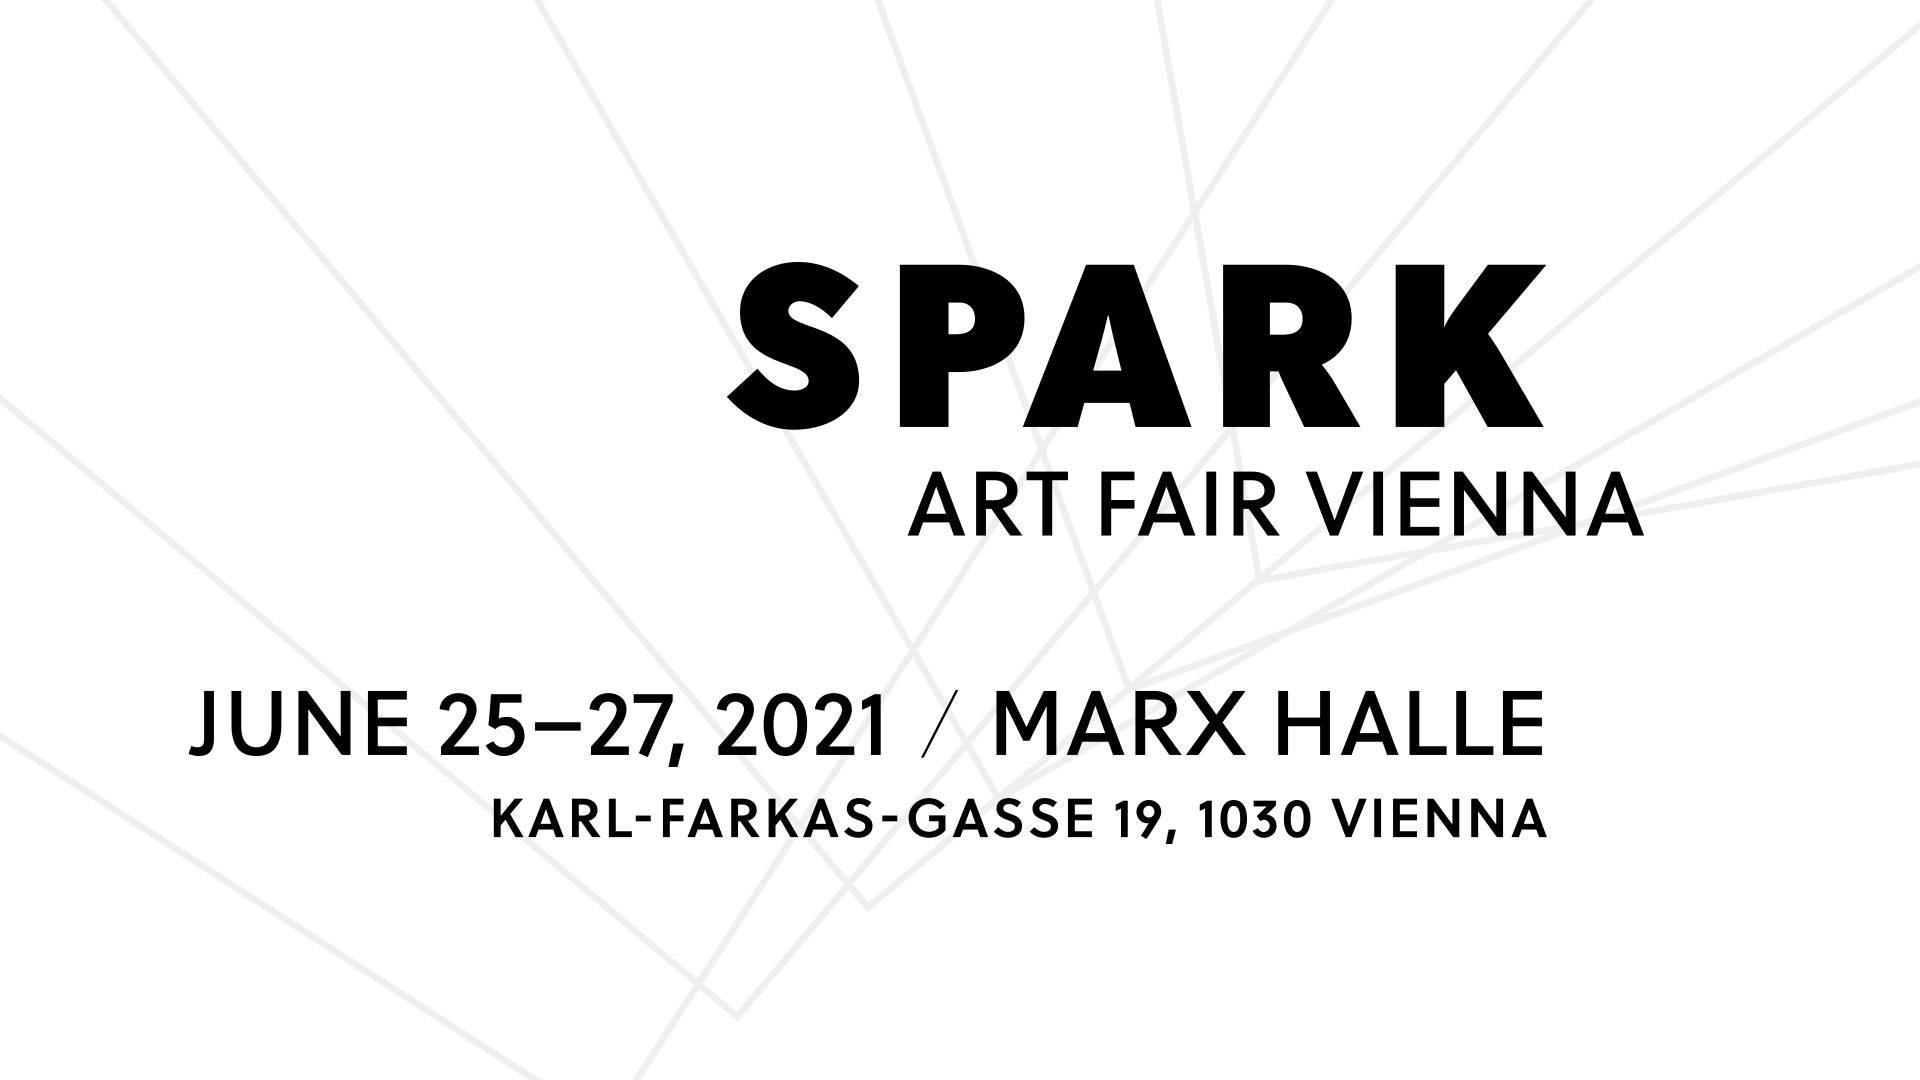 Events Wien: SPARK Art Fair Vienna 2021